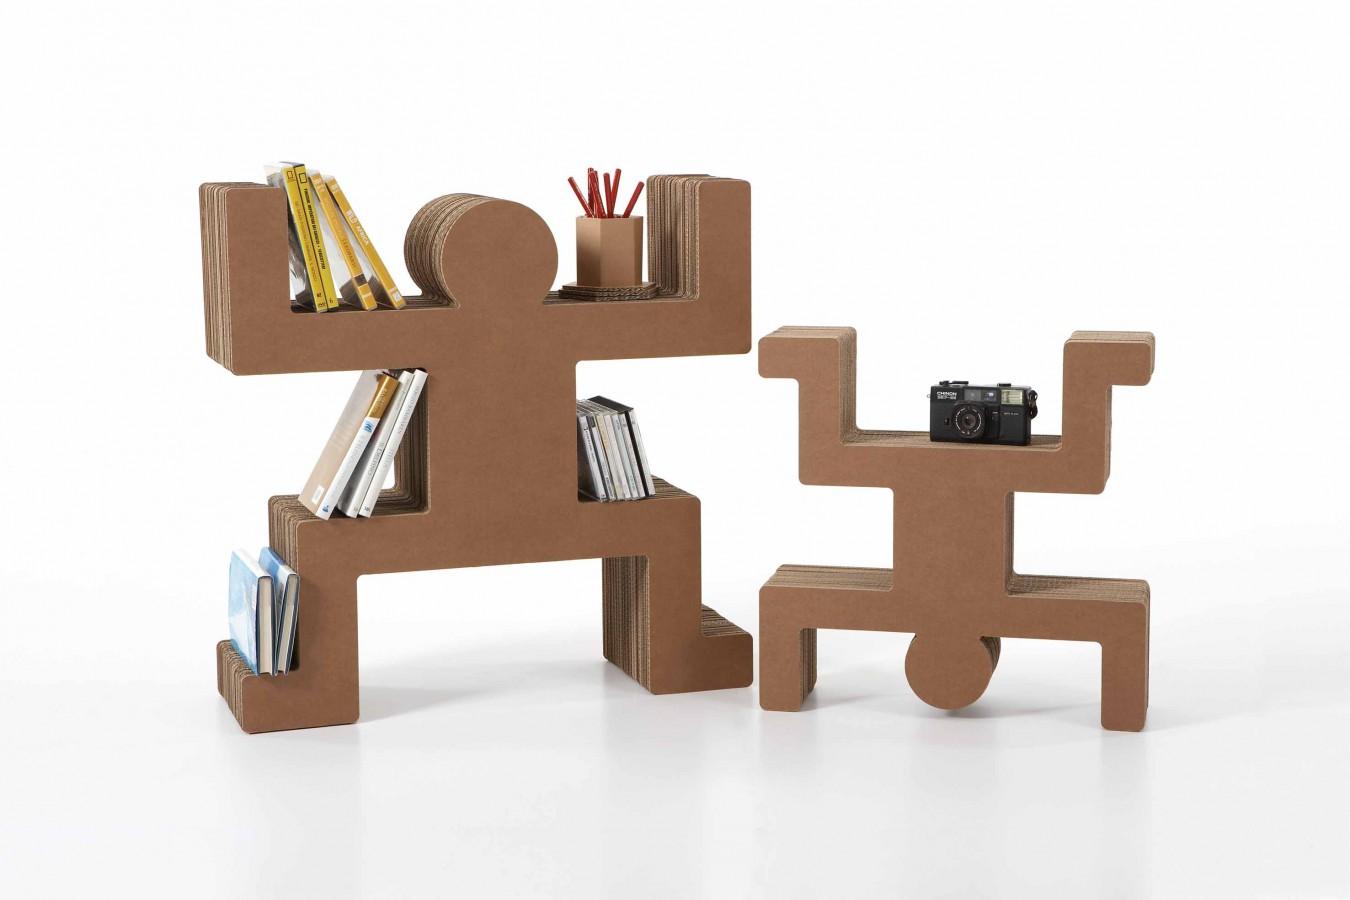 Spanky-Cardboard-Shelving-For-Kid's-Room.jpg